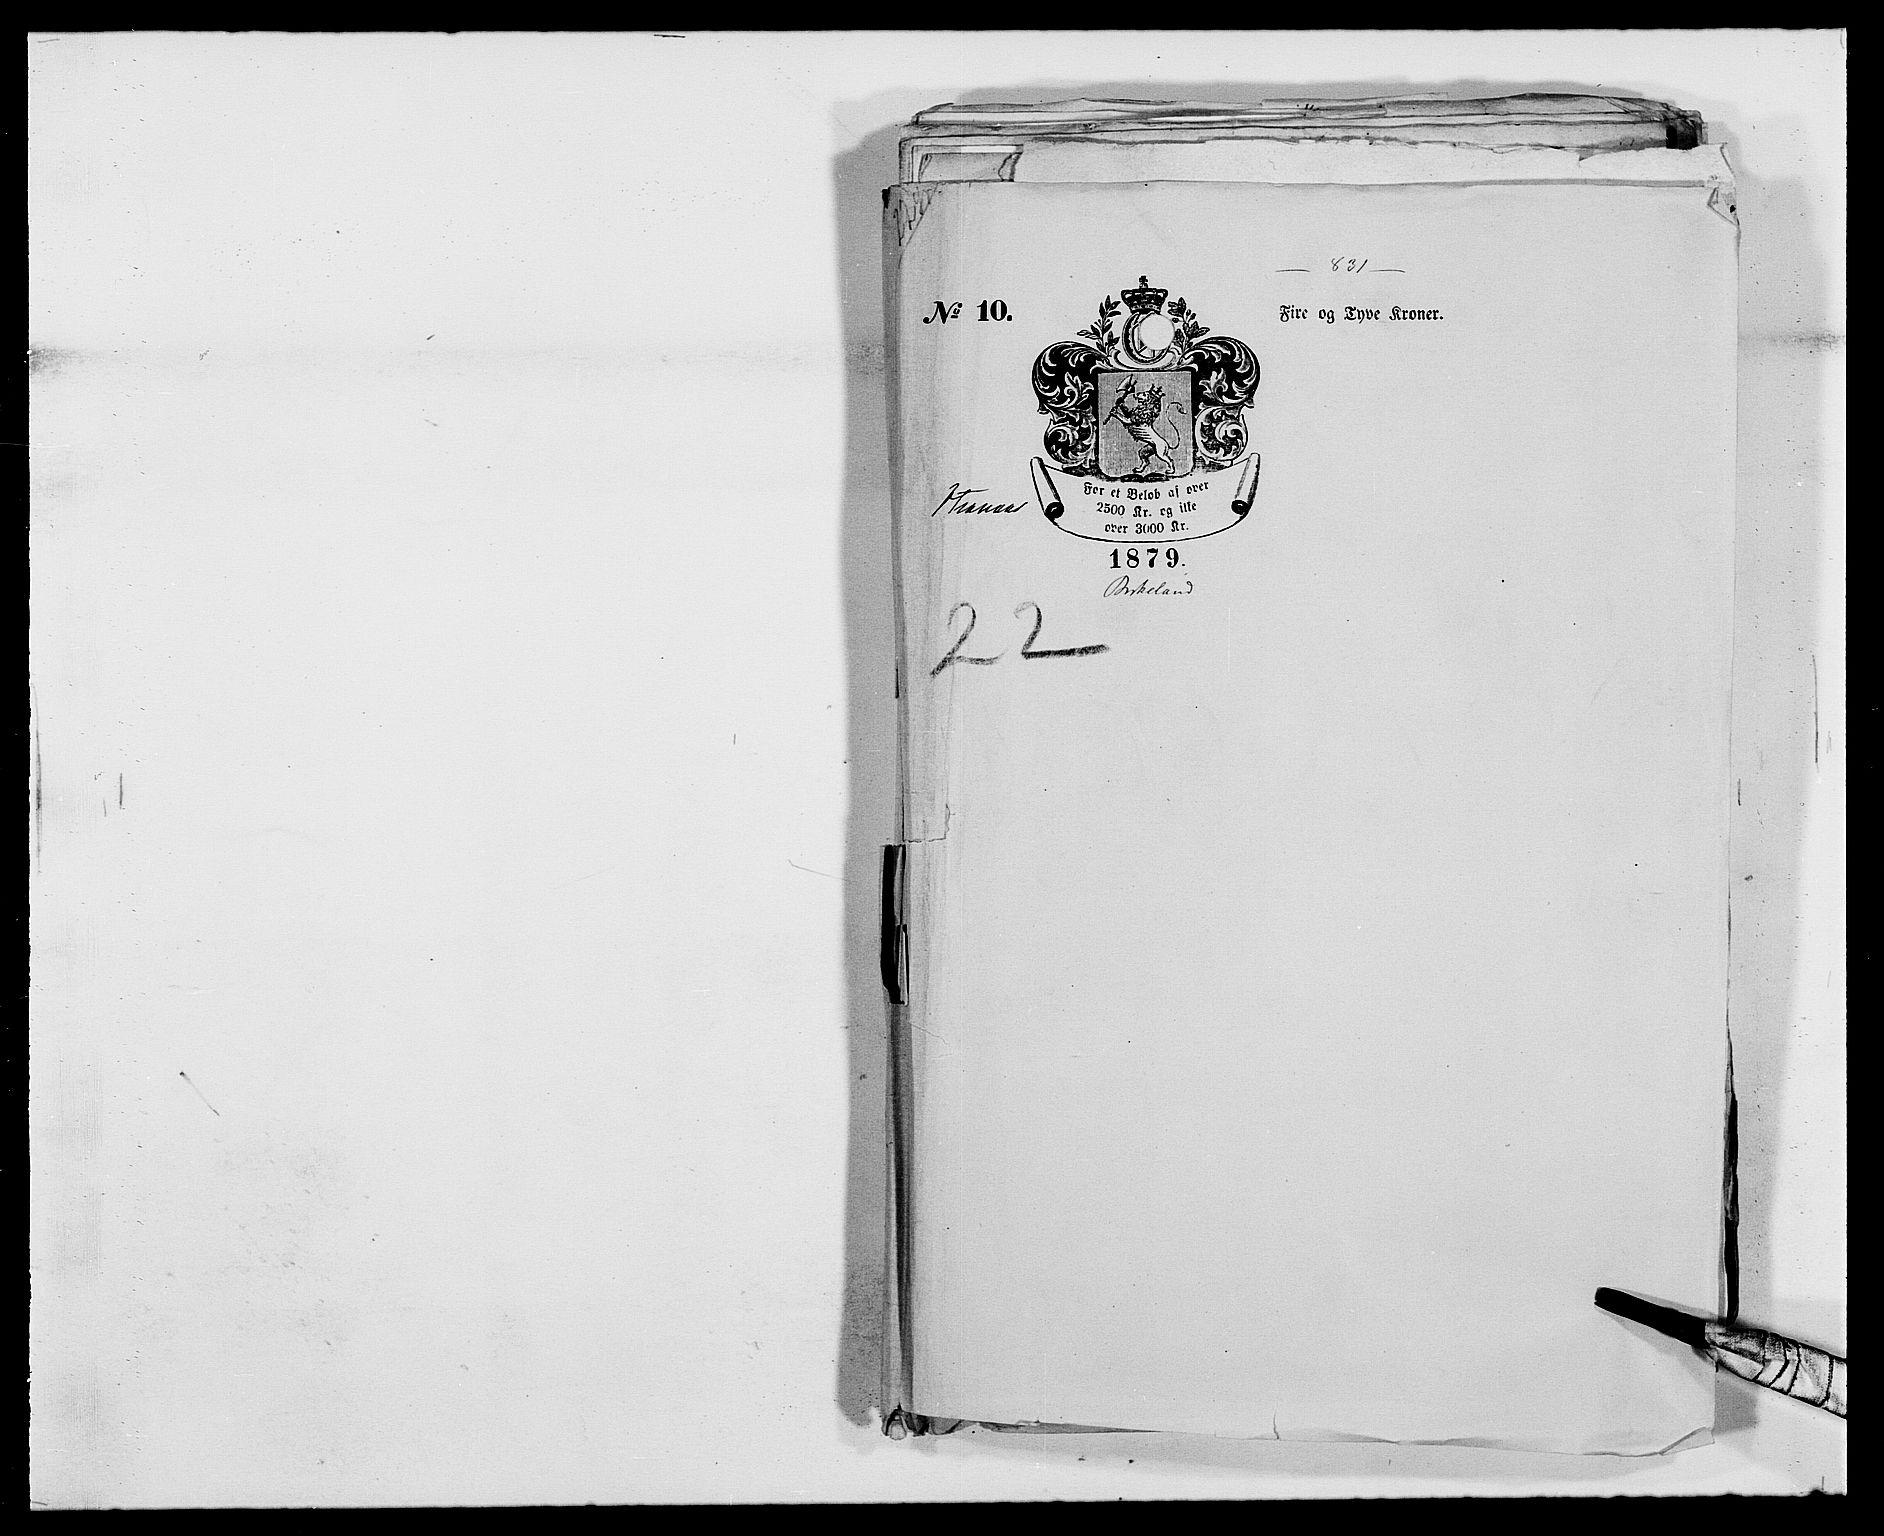 RA, Rentekammeret inntil 1814, Reviderte regnskaper, Fogderegnskap, R41/L2532: Fogderegnskap Lista, 1683, s. 256